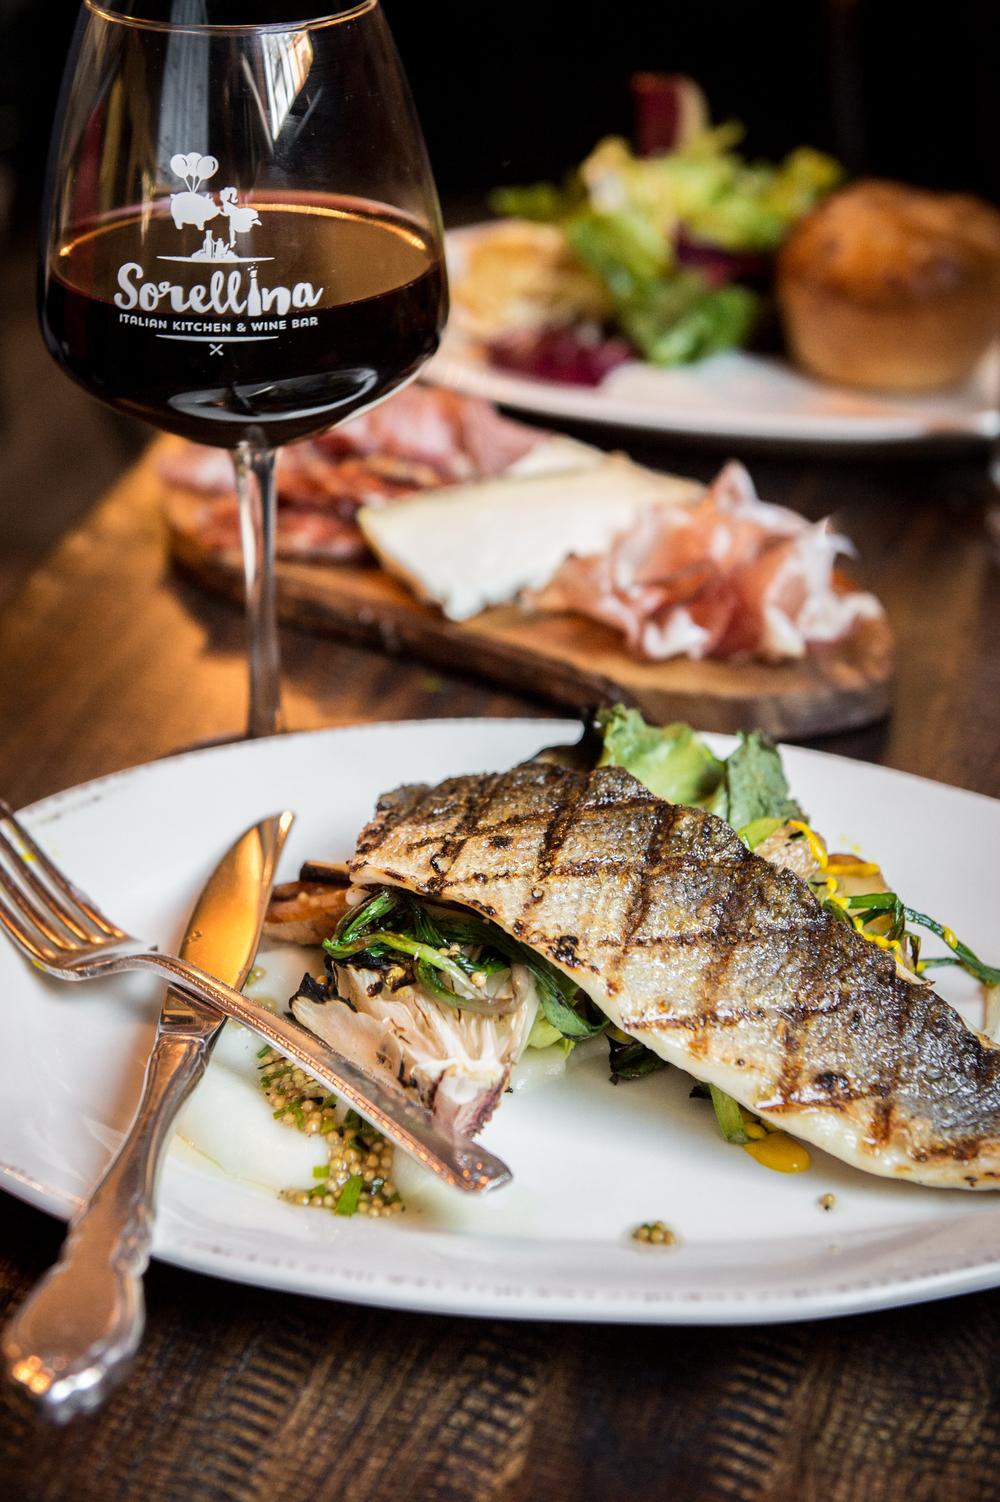 Sorellina_Food71.JPG